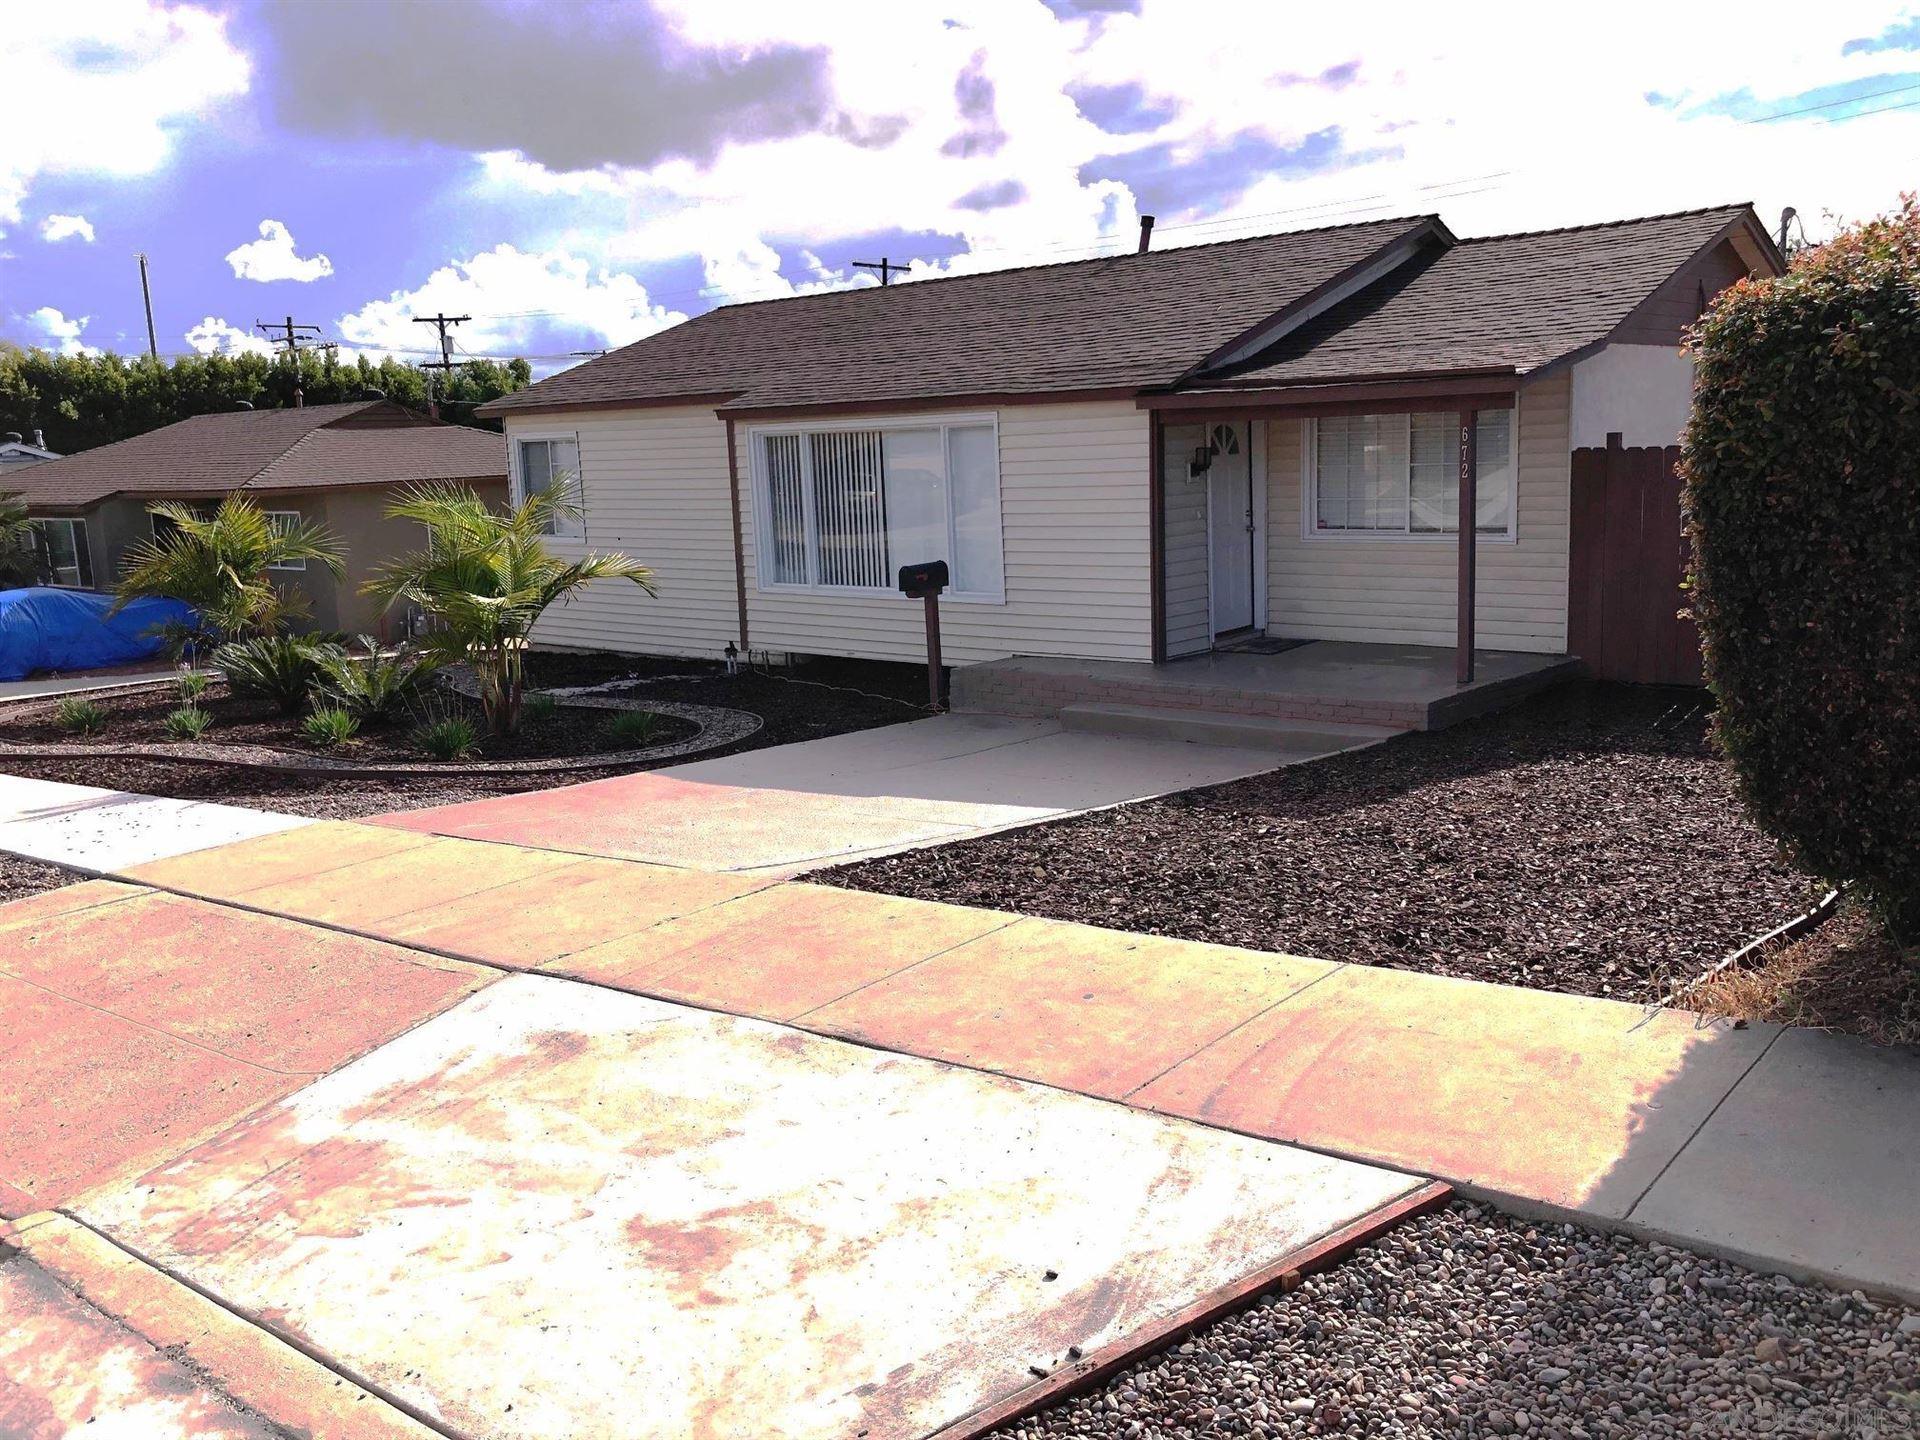 Photo of 672 Carla Ave, Chula Vista, CA 91910 (MLS # 210029517)